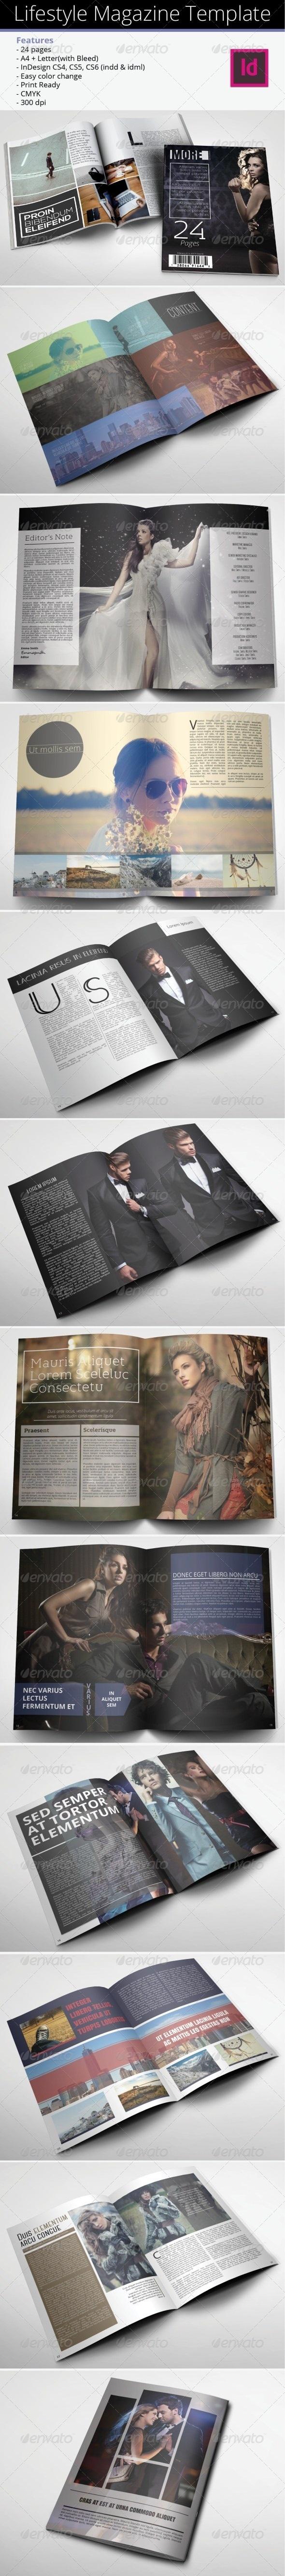 Lifestyle Magazine Template - Magazines Print Templates